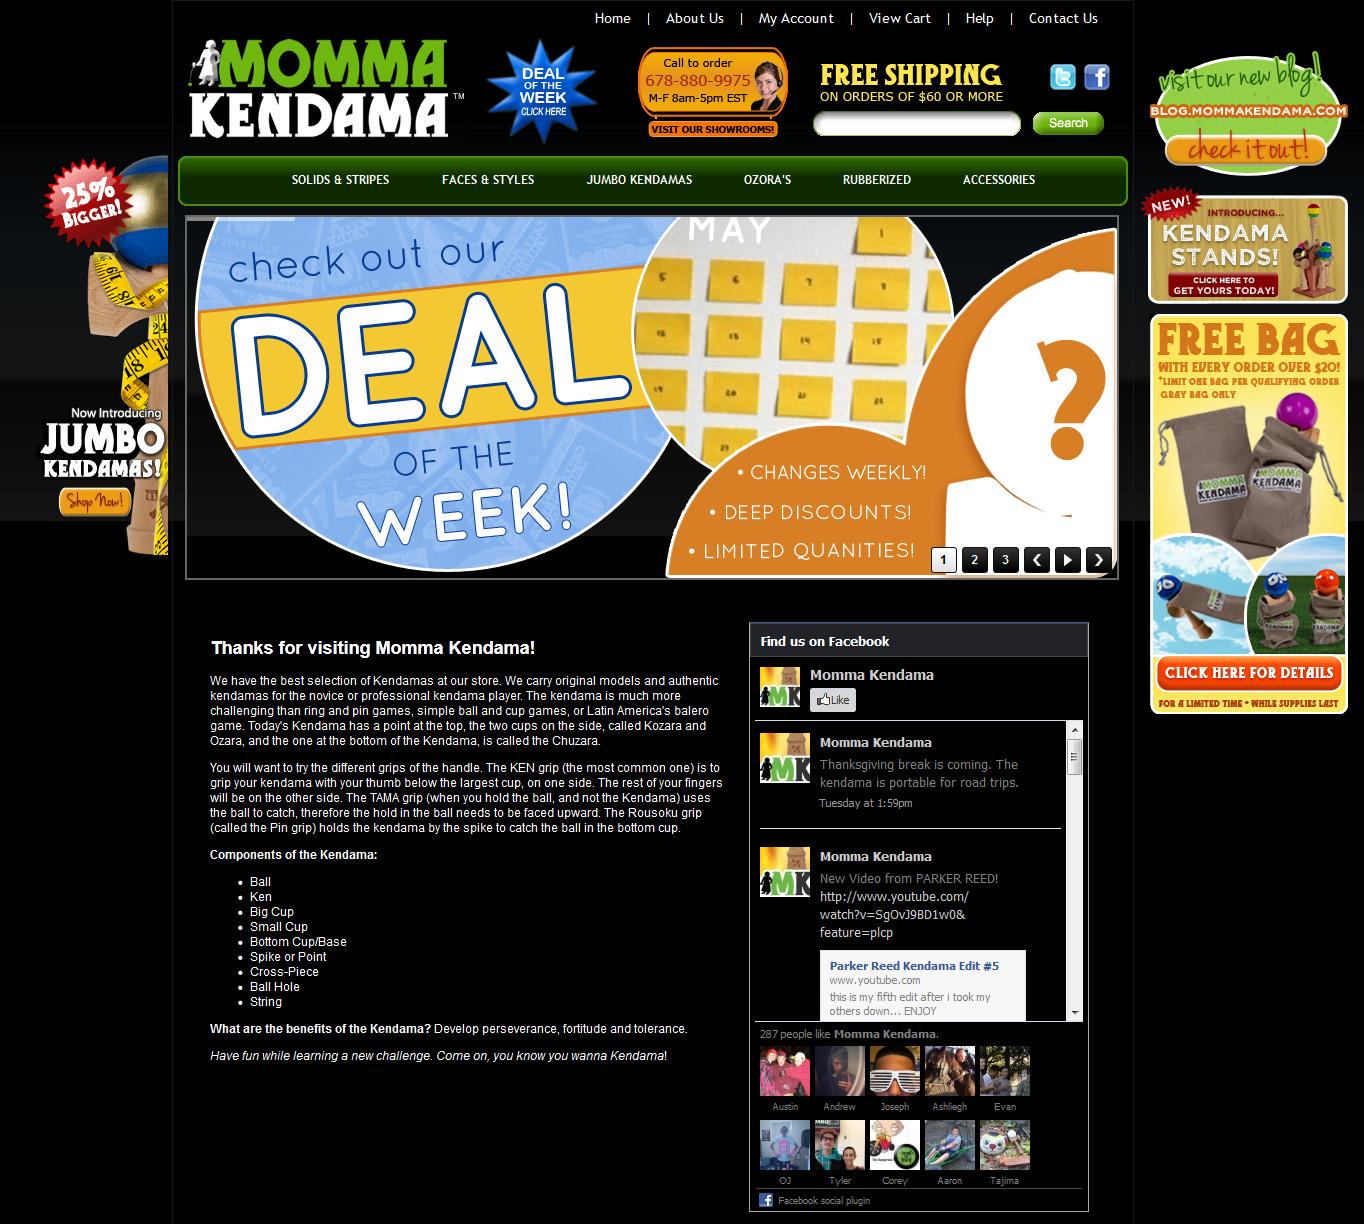 momma kendama website homepage